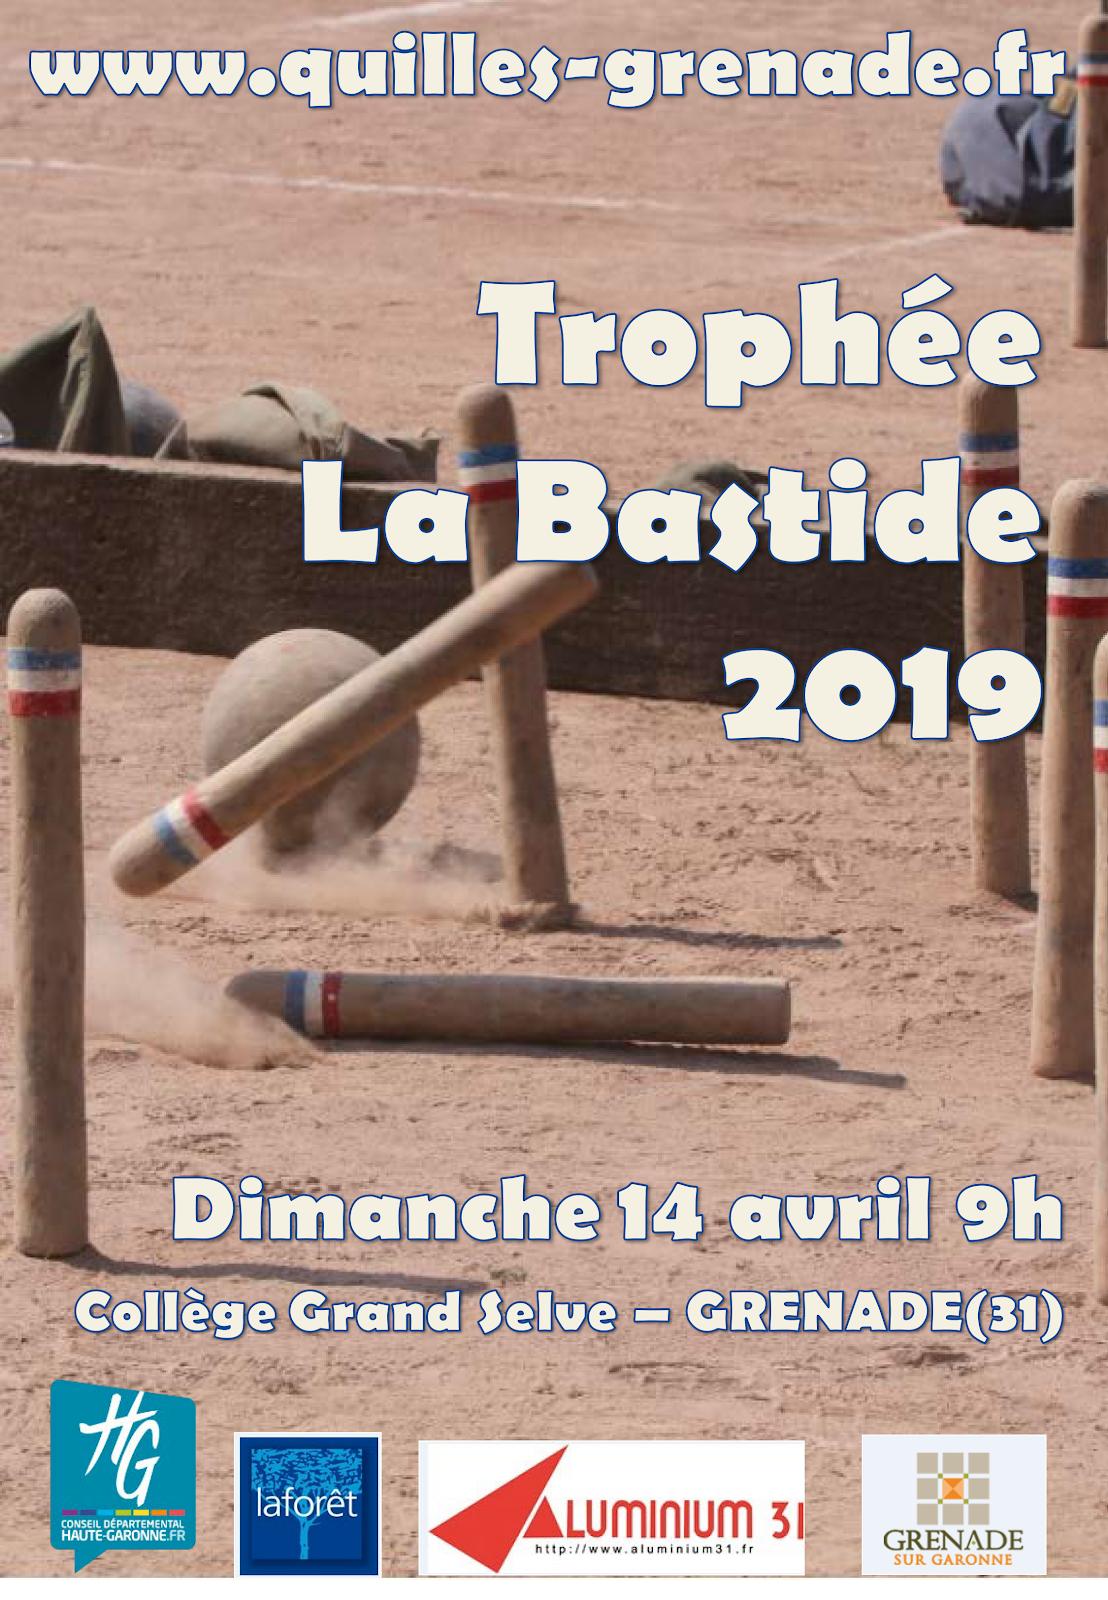 Trophée La Bastide - 2019